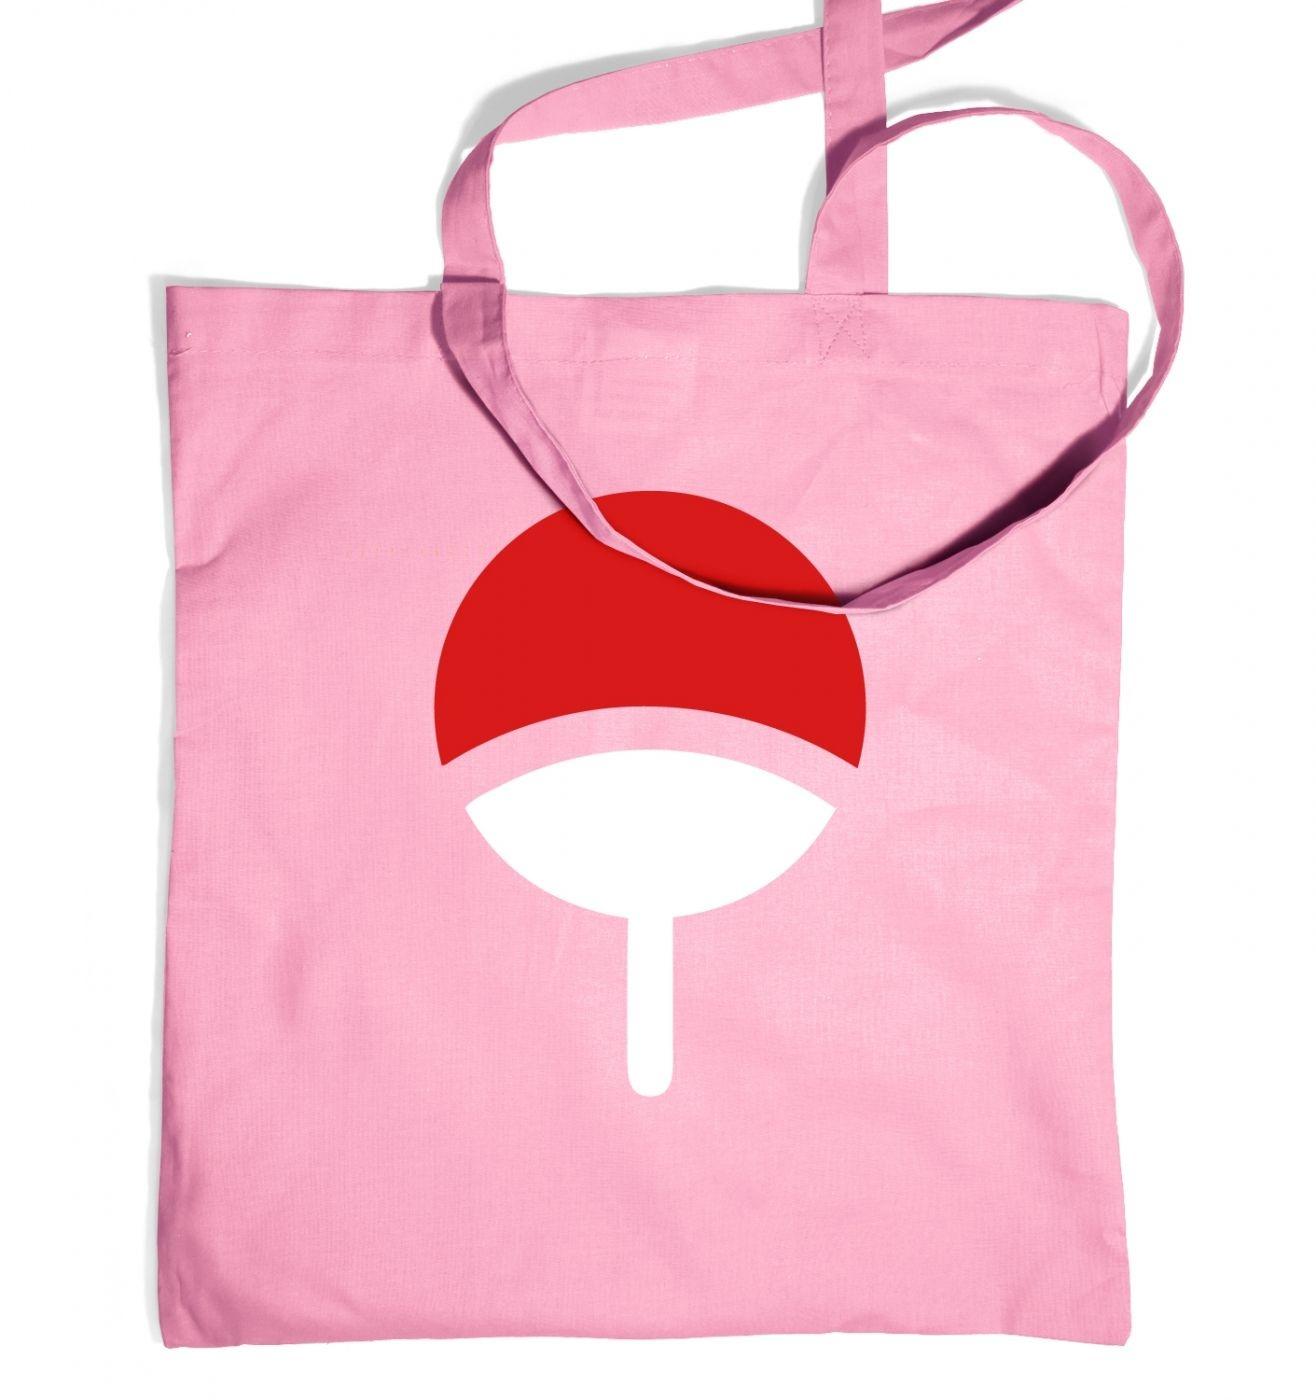 Uchiha Family Tote Bag